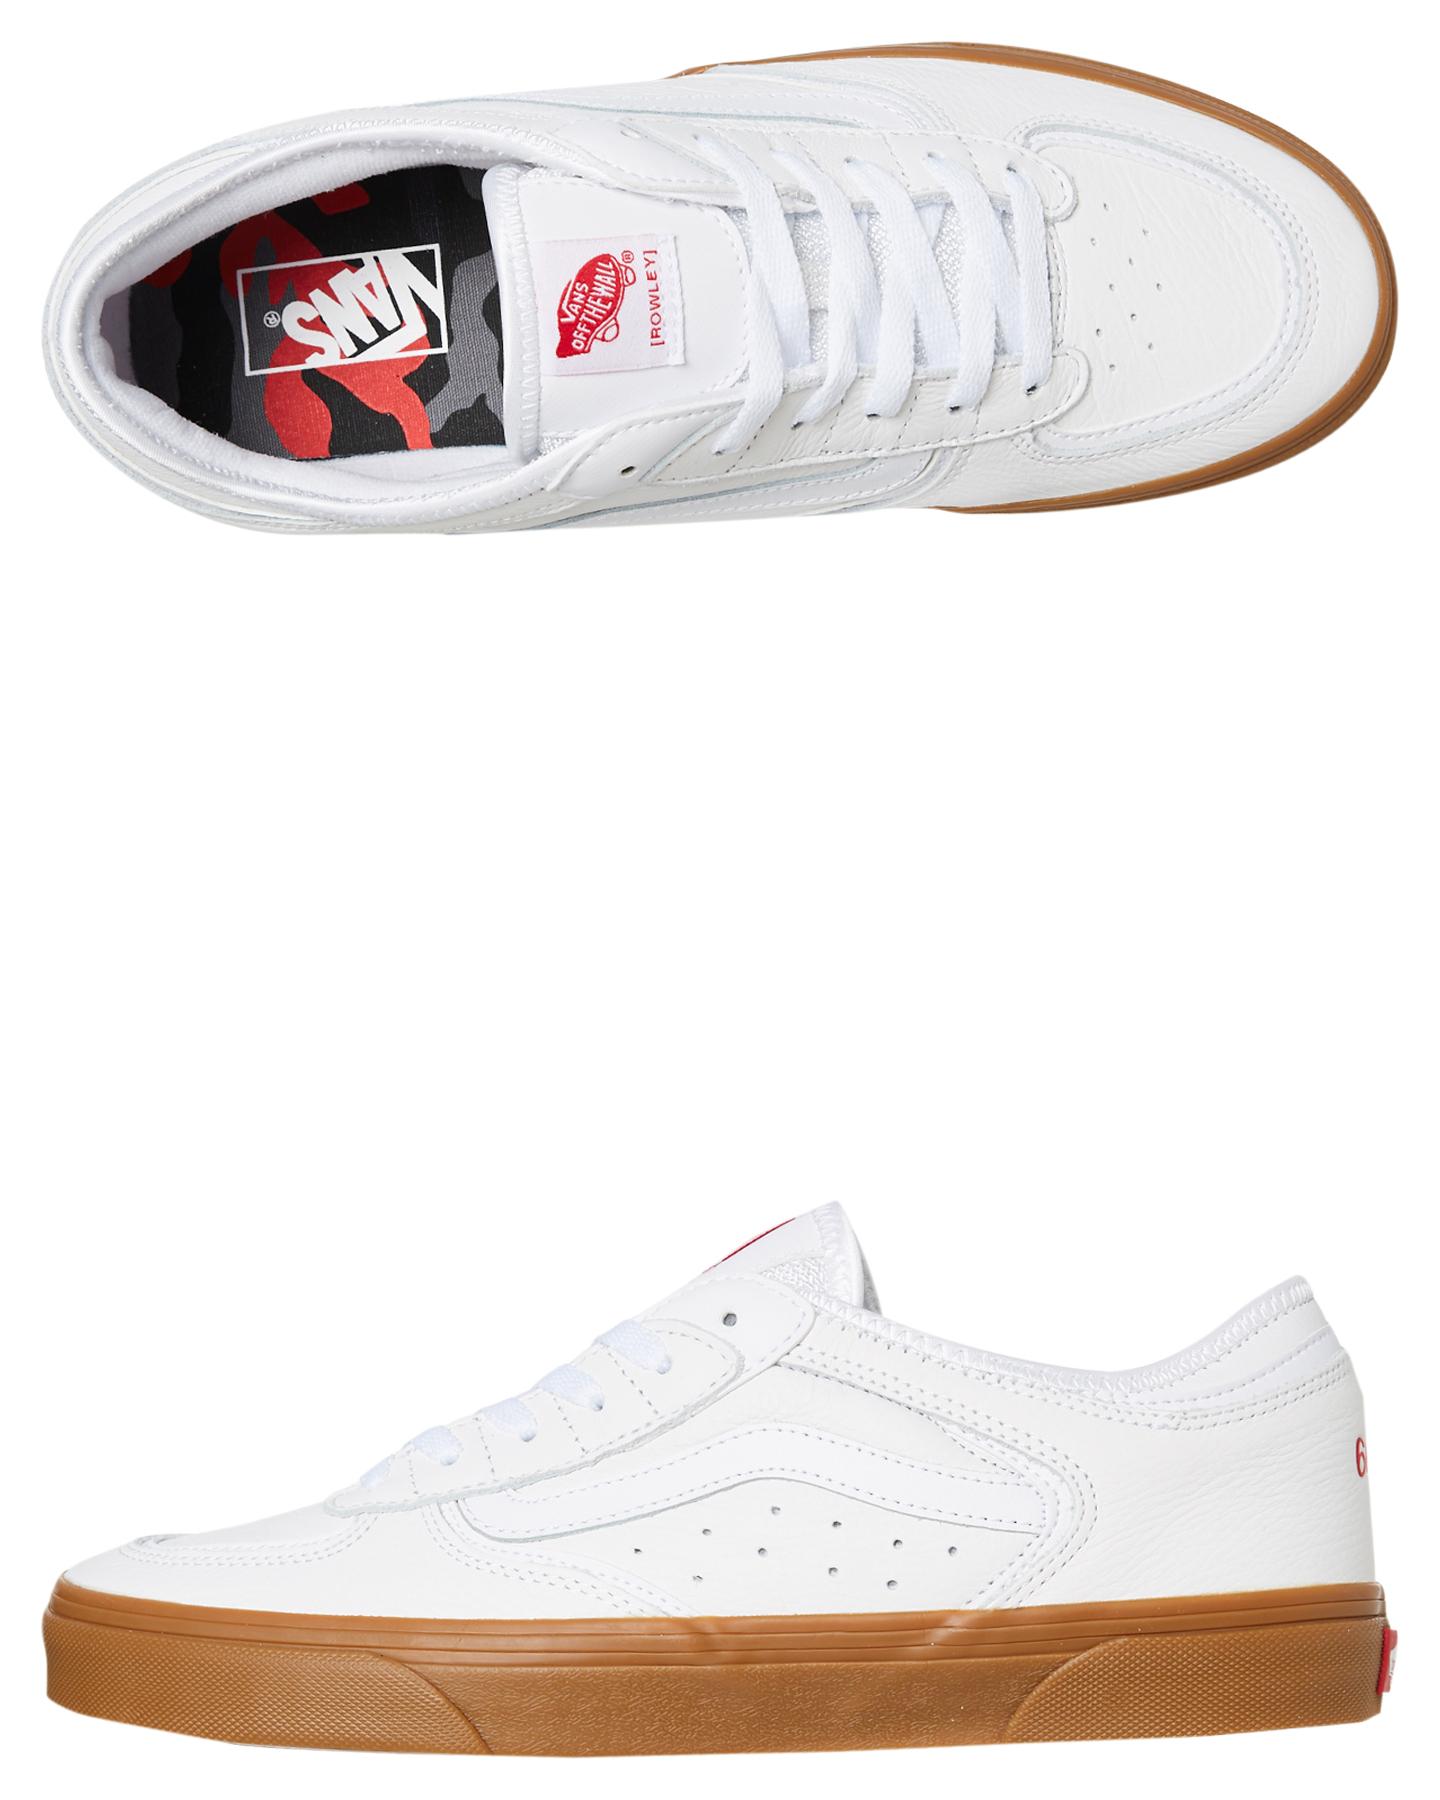 Vans Rowley Classic Leather Shoe - True